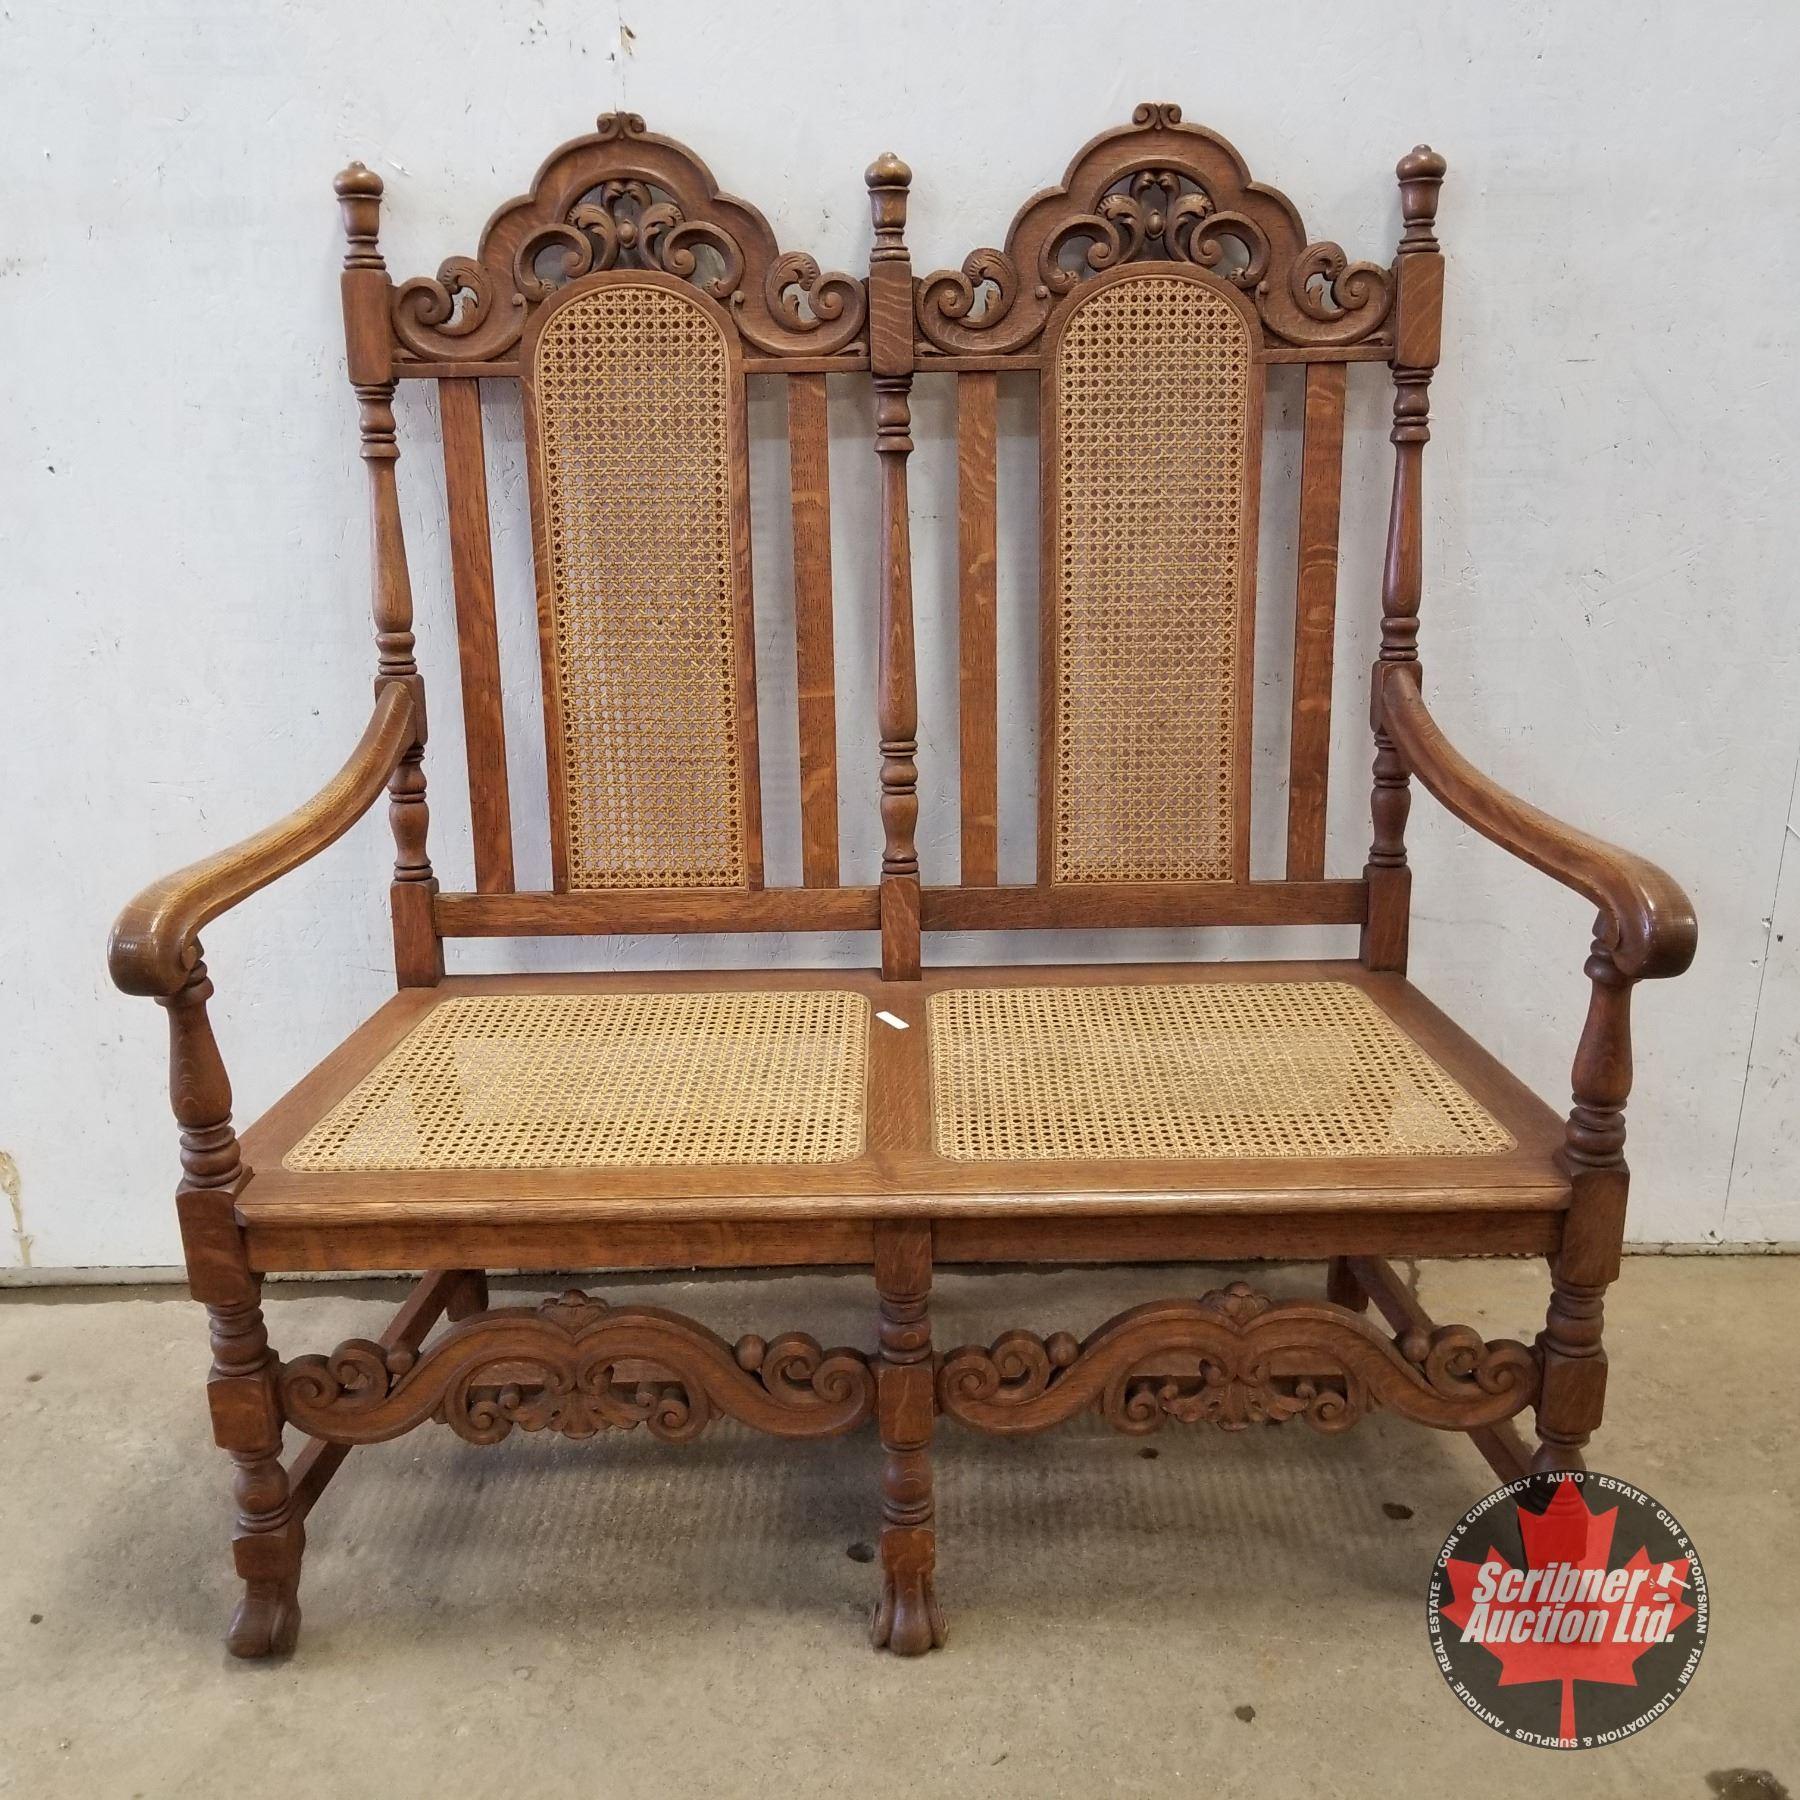 Surprising Oak Cane Hall Seat Bench 1920 50H X 47W X 20D Lamtechconsult Wood Chair Design Ideas Lamtechconsultcom